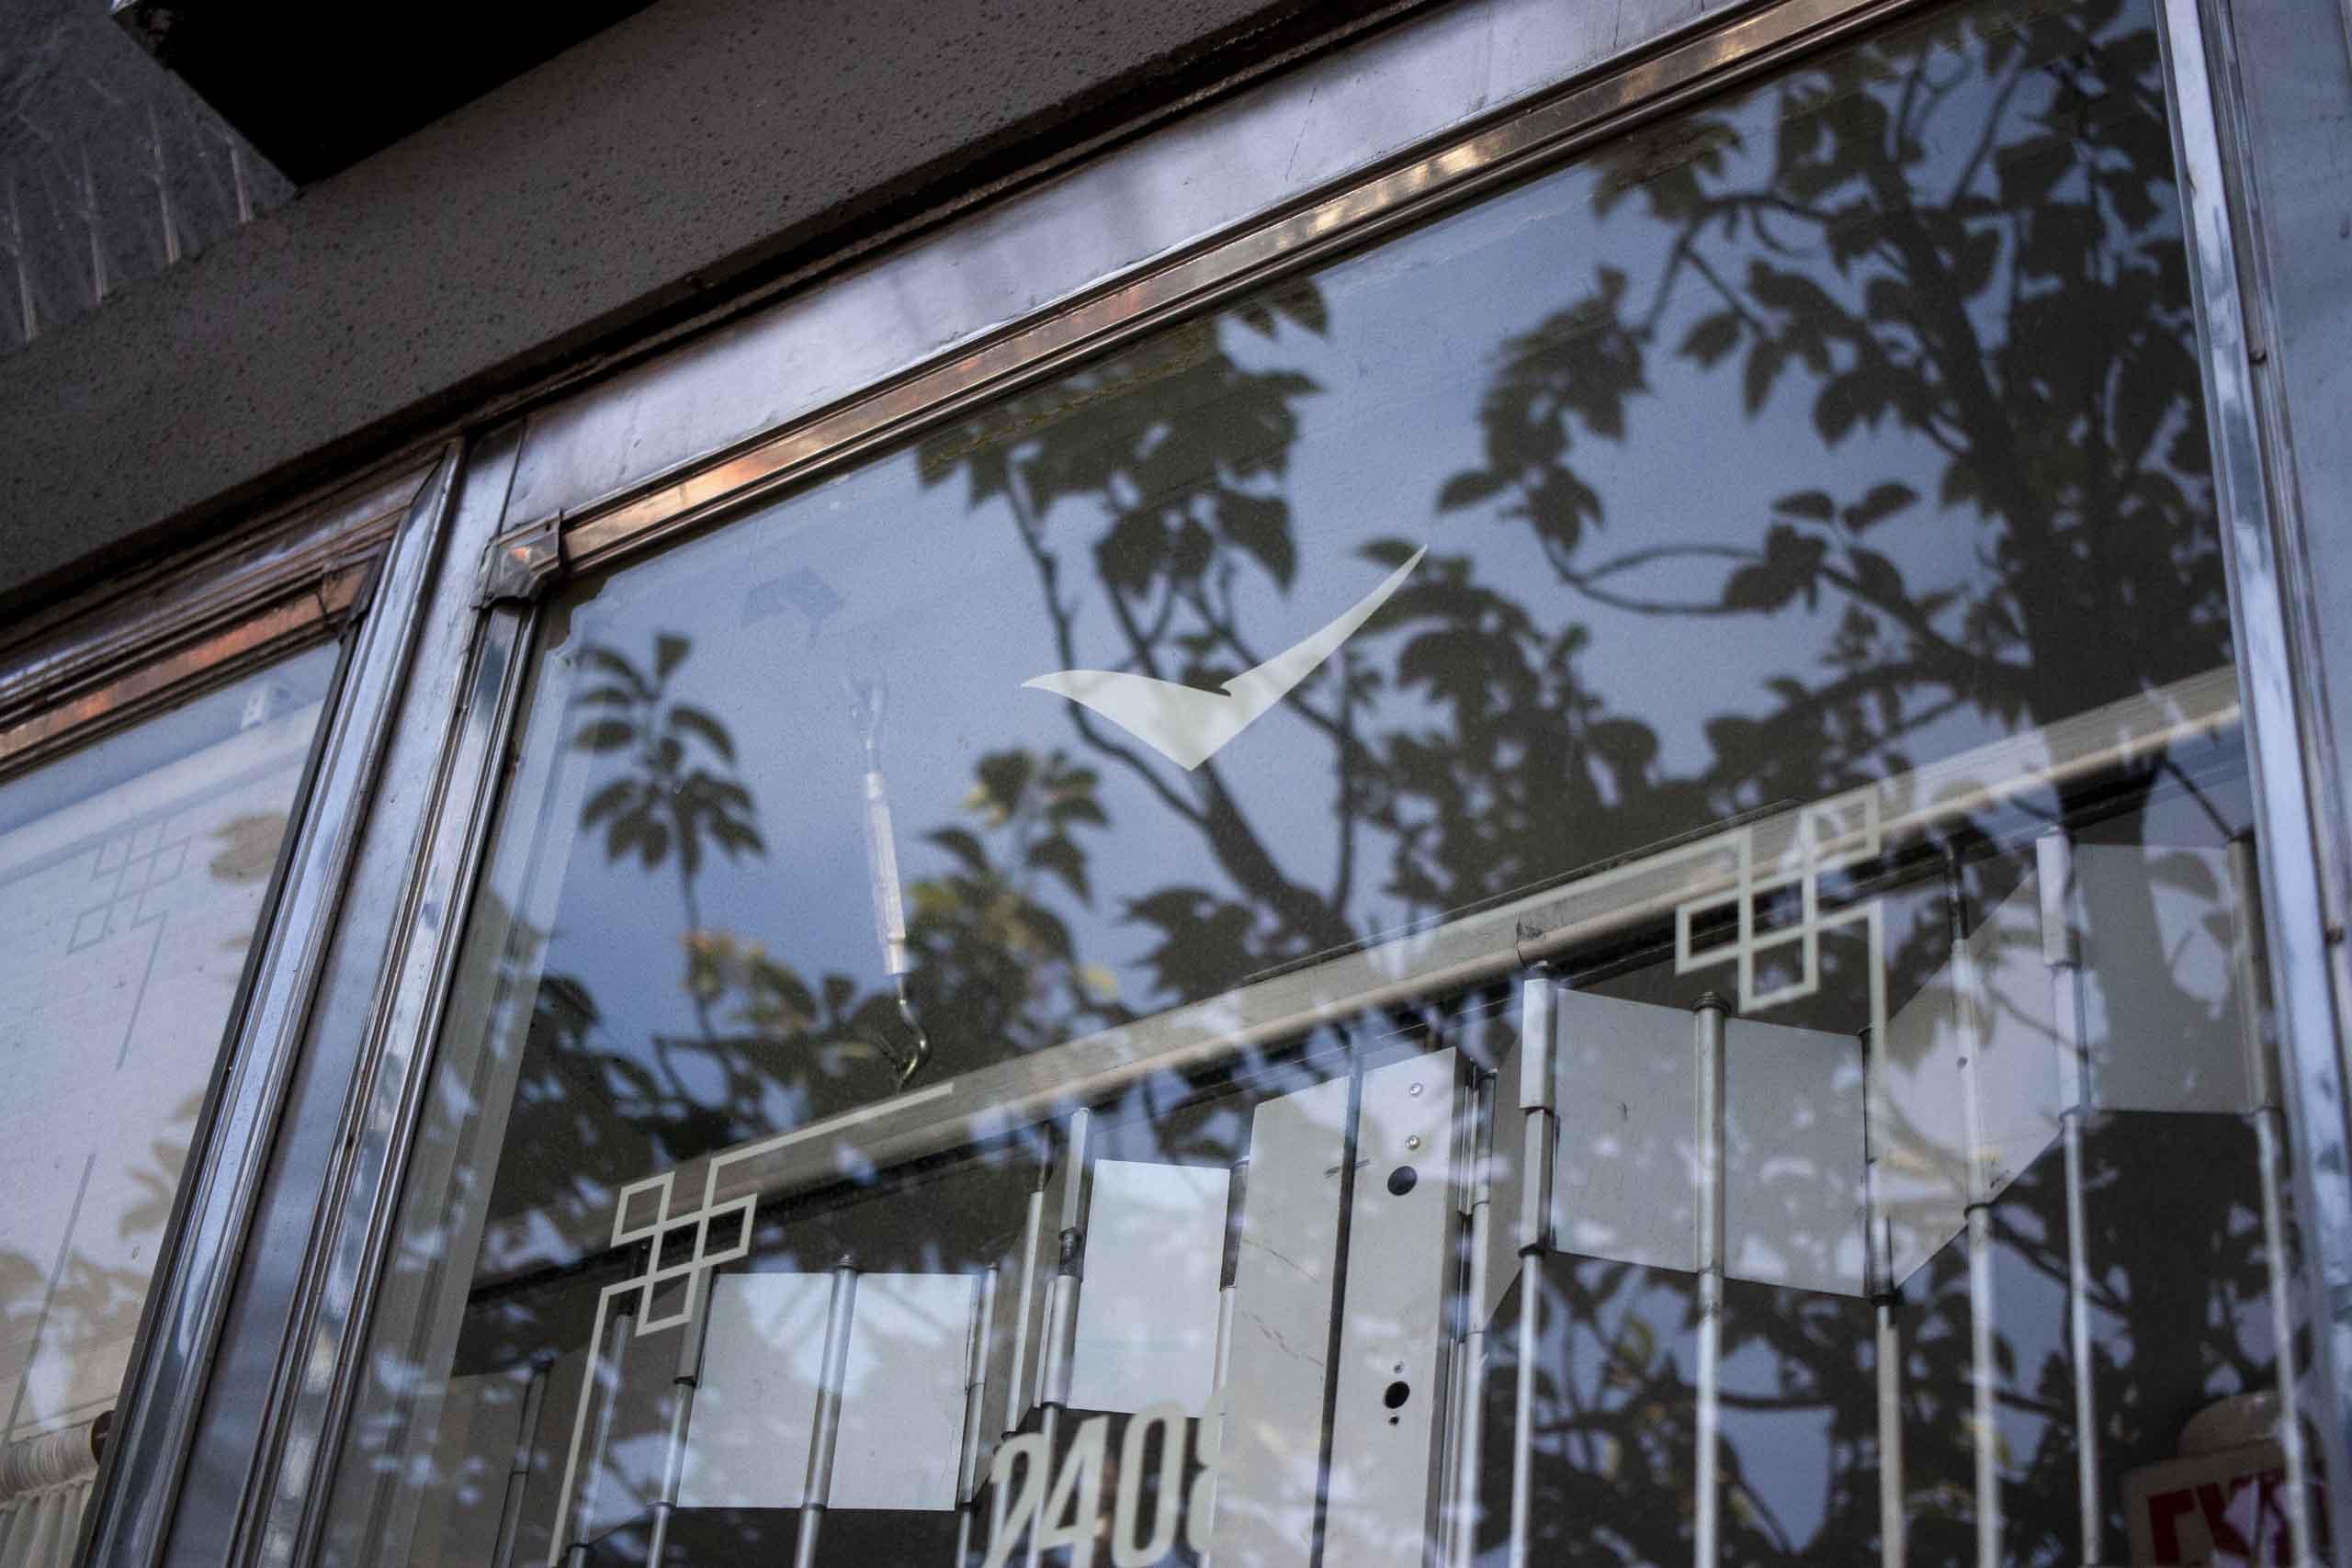 Handpainted blue Heron Logo on the window — by Yagnyuk.